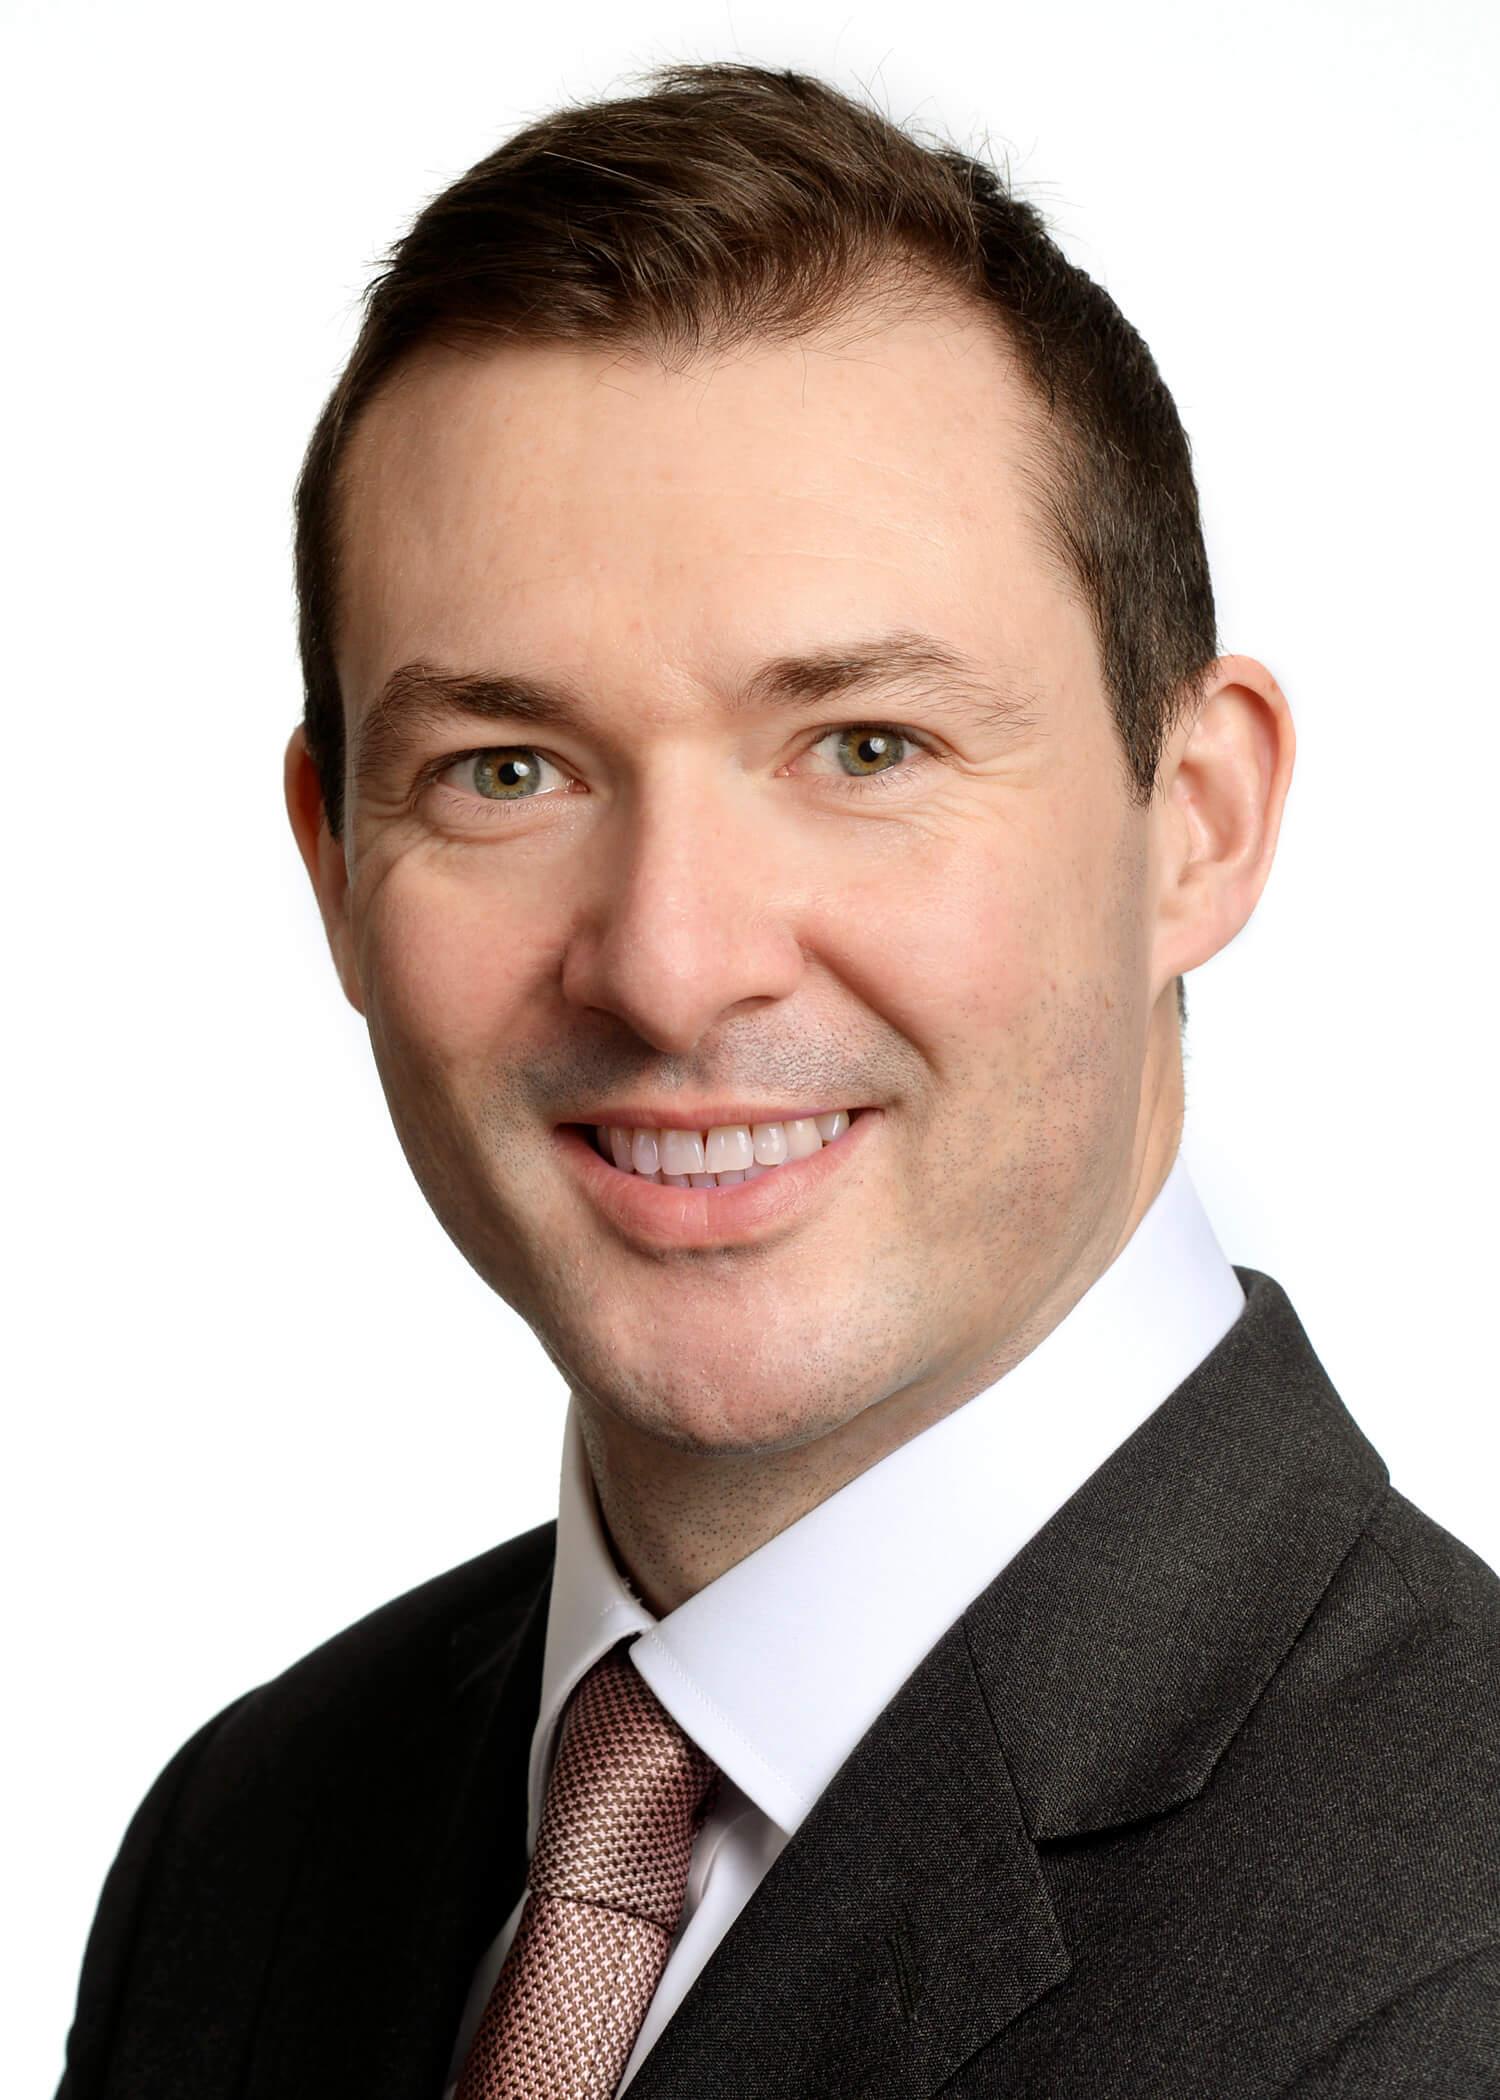 Weil Appoints Chris McLaughlin